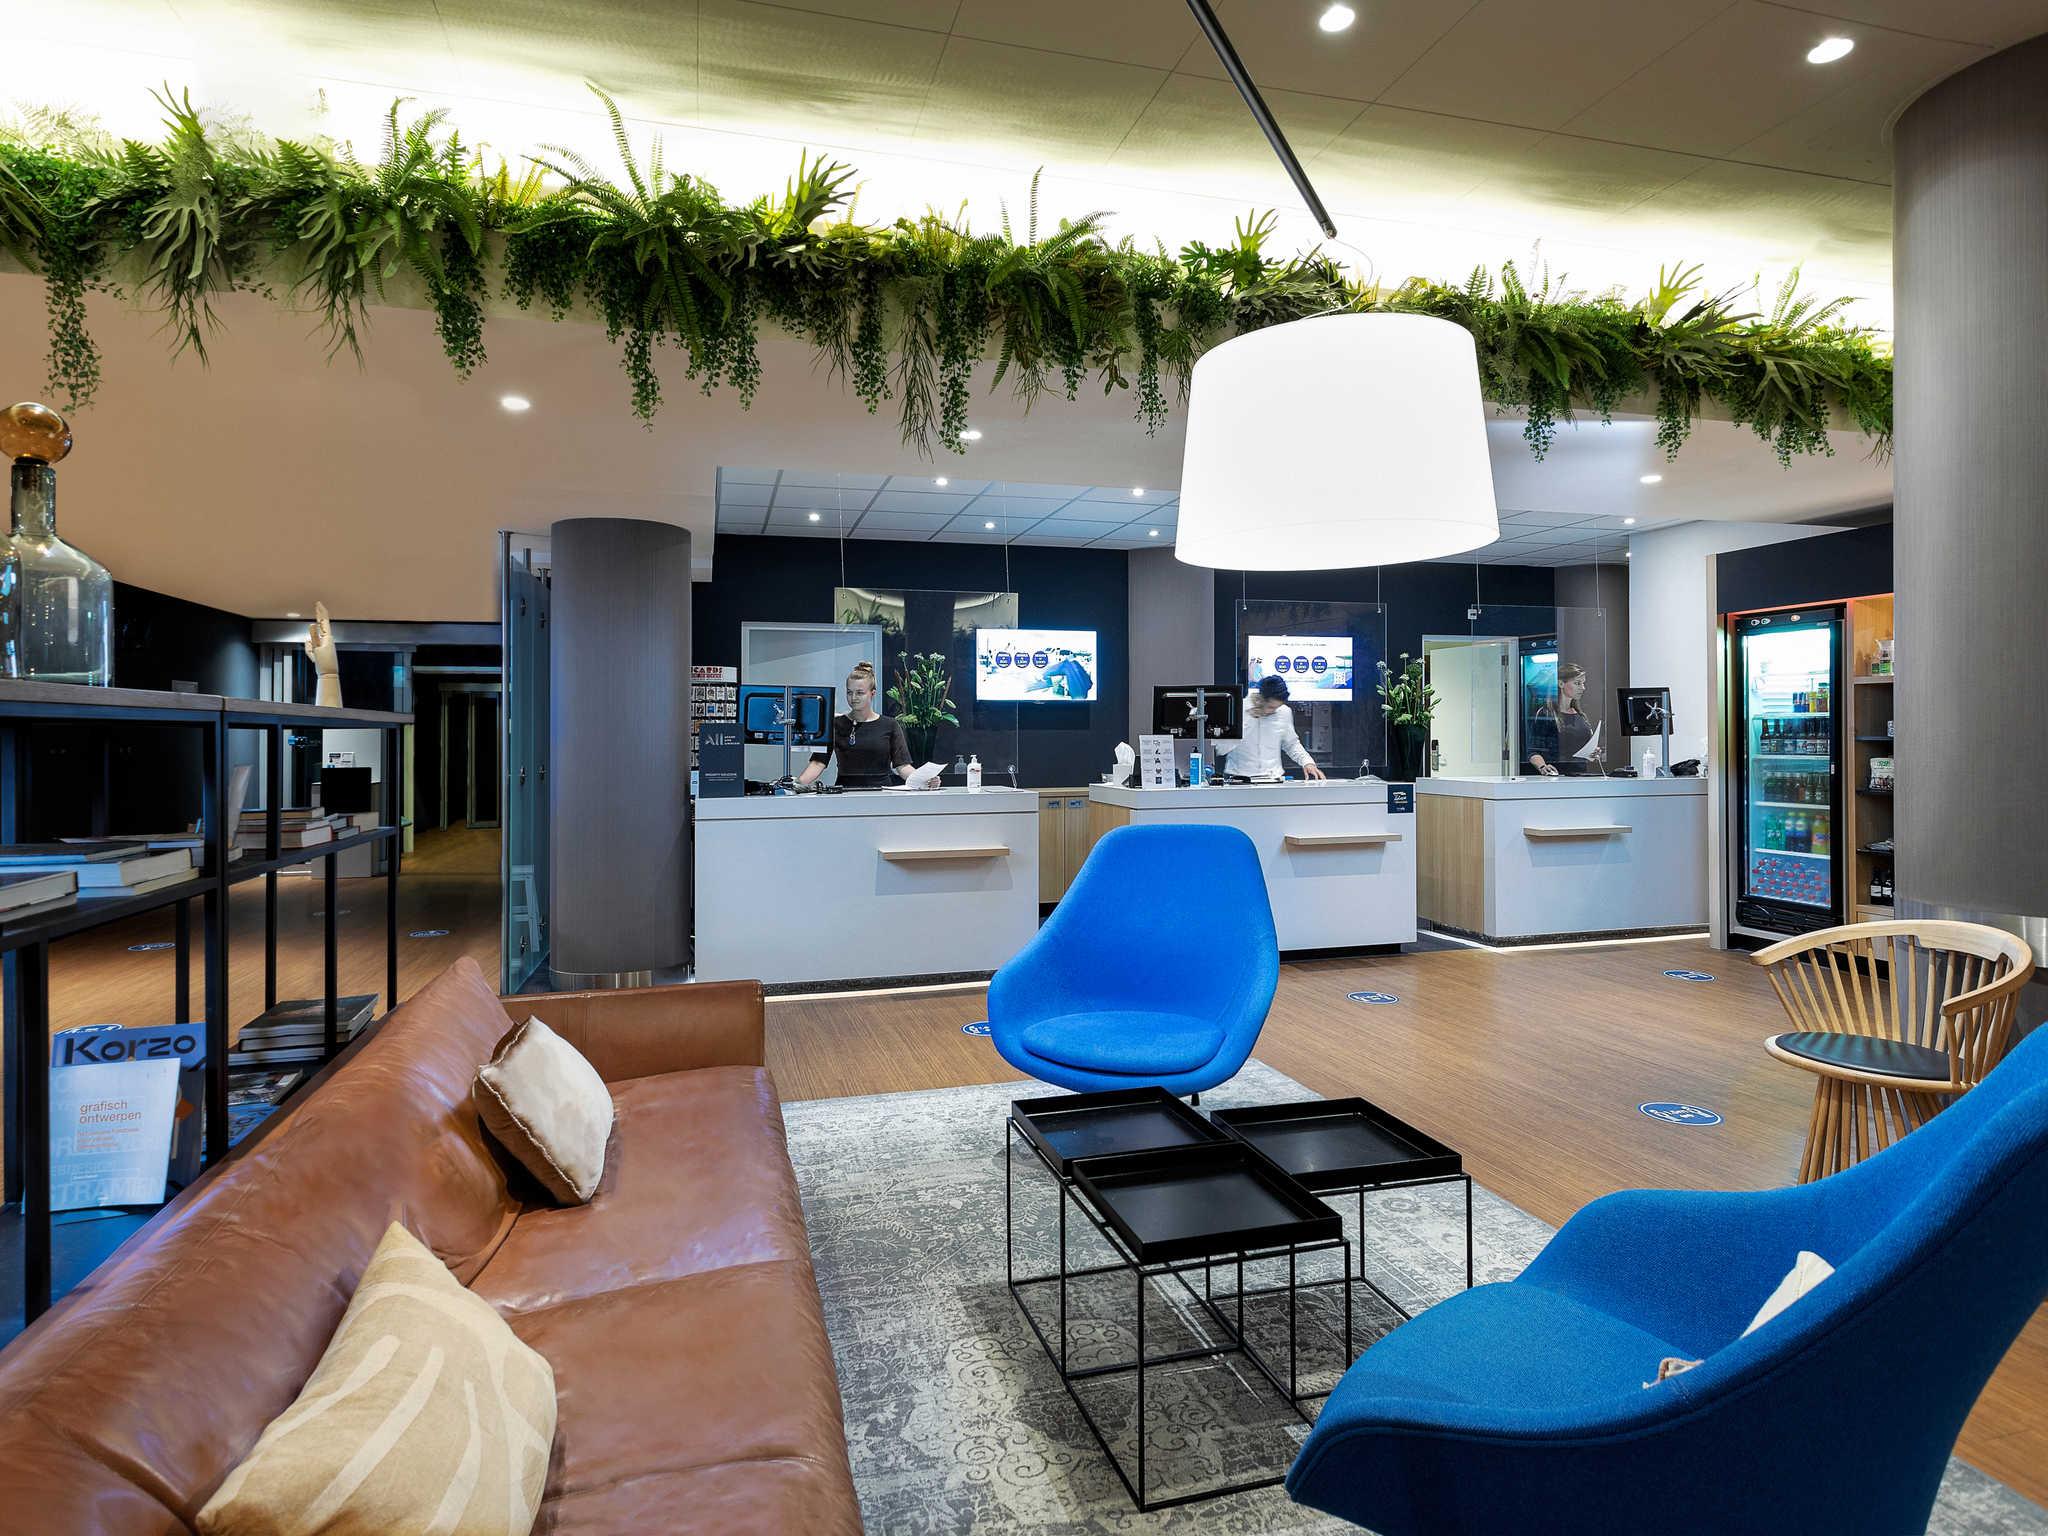 Family Hotel The Hague City Centre Novotel World Forum